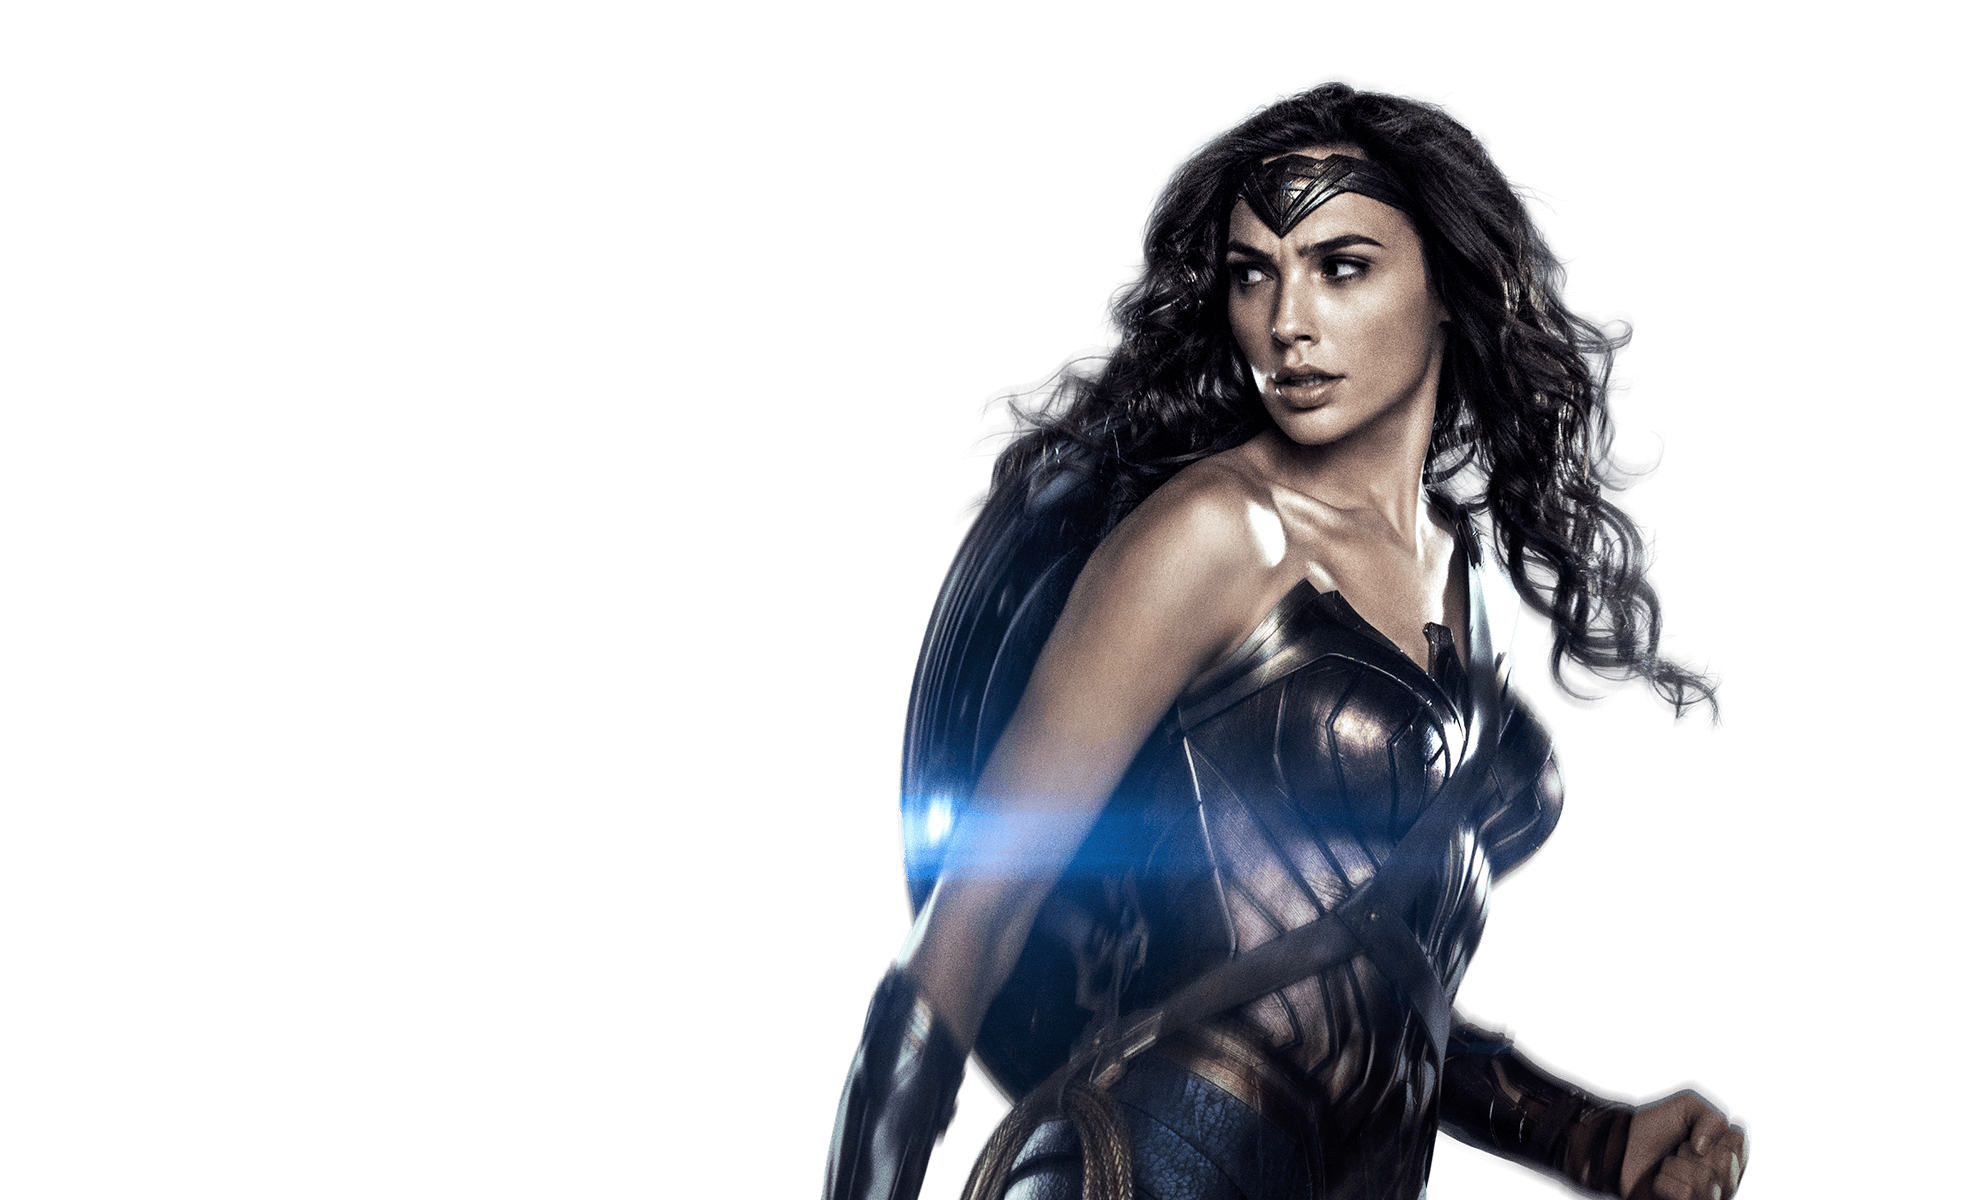 Batman v Superman press conference - Gal Gadot as Wonder ...